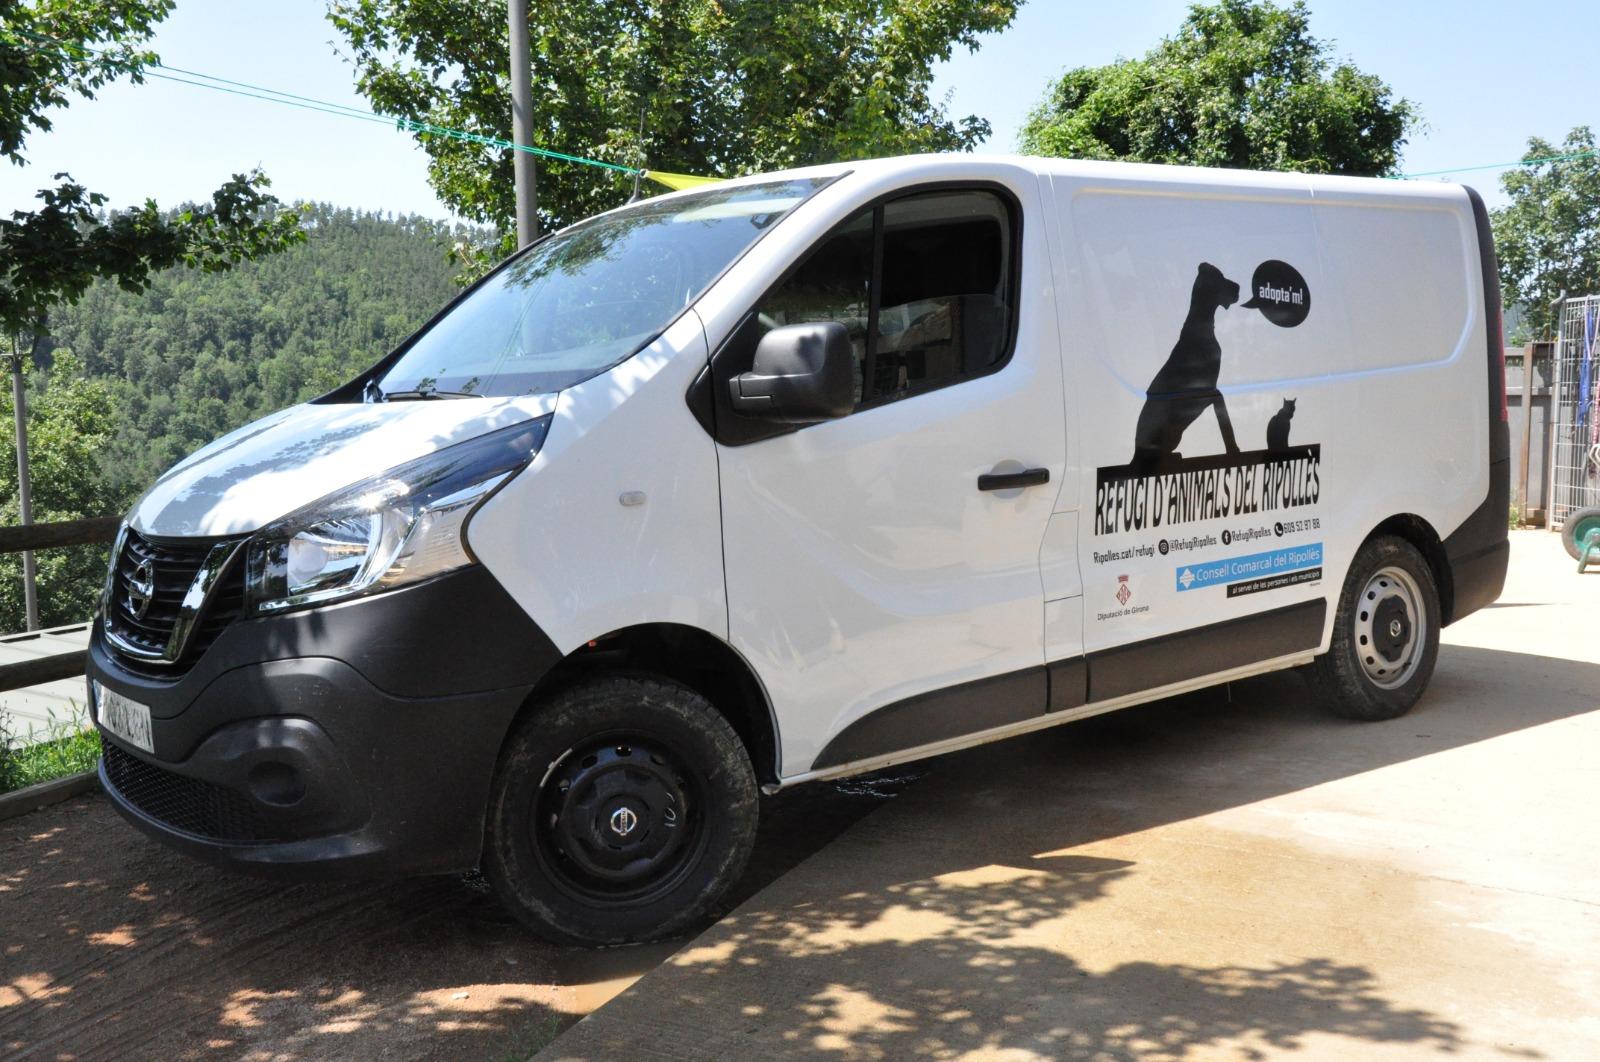 refugi-animals-ripolles-vehicle-nou